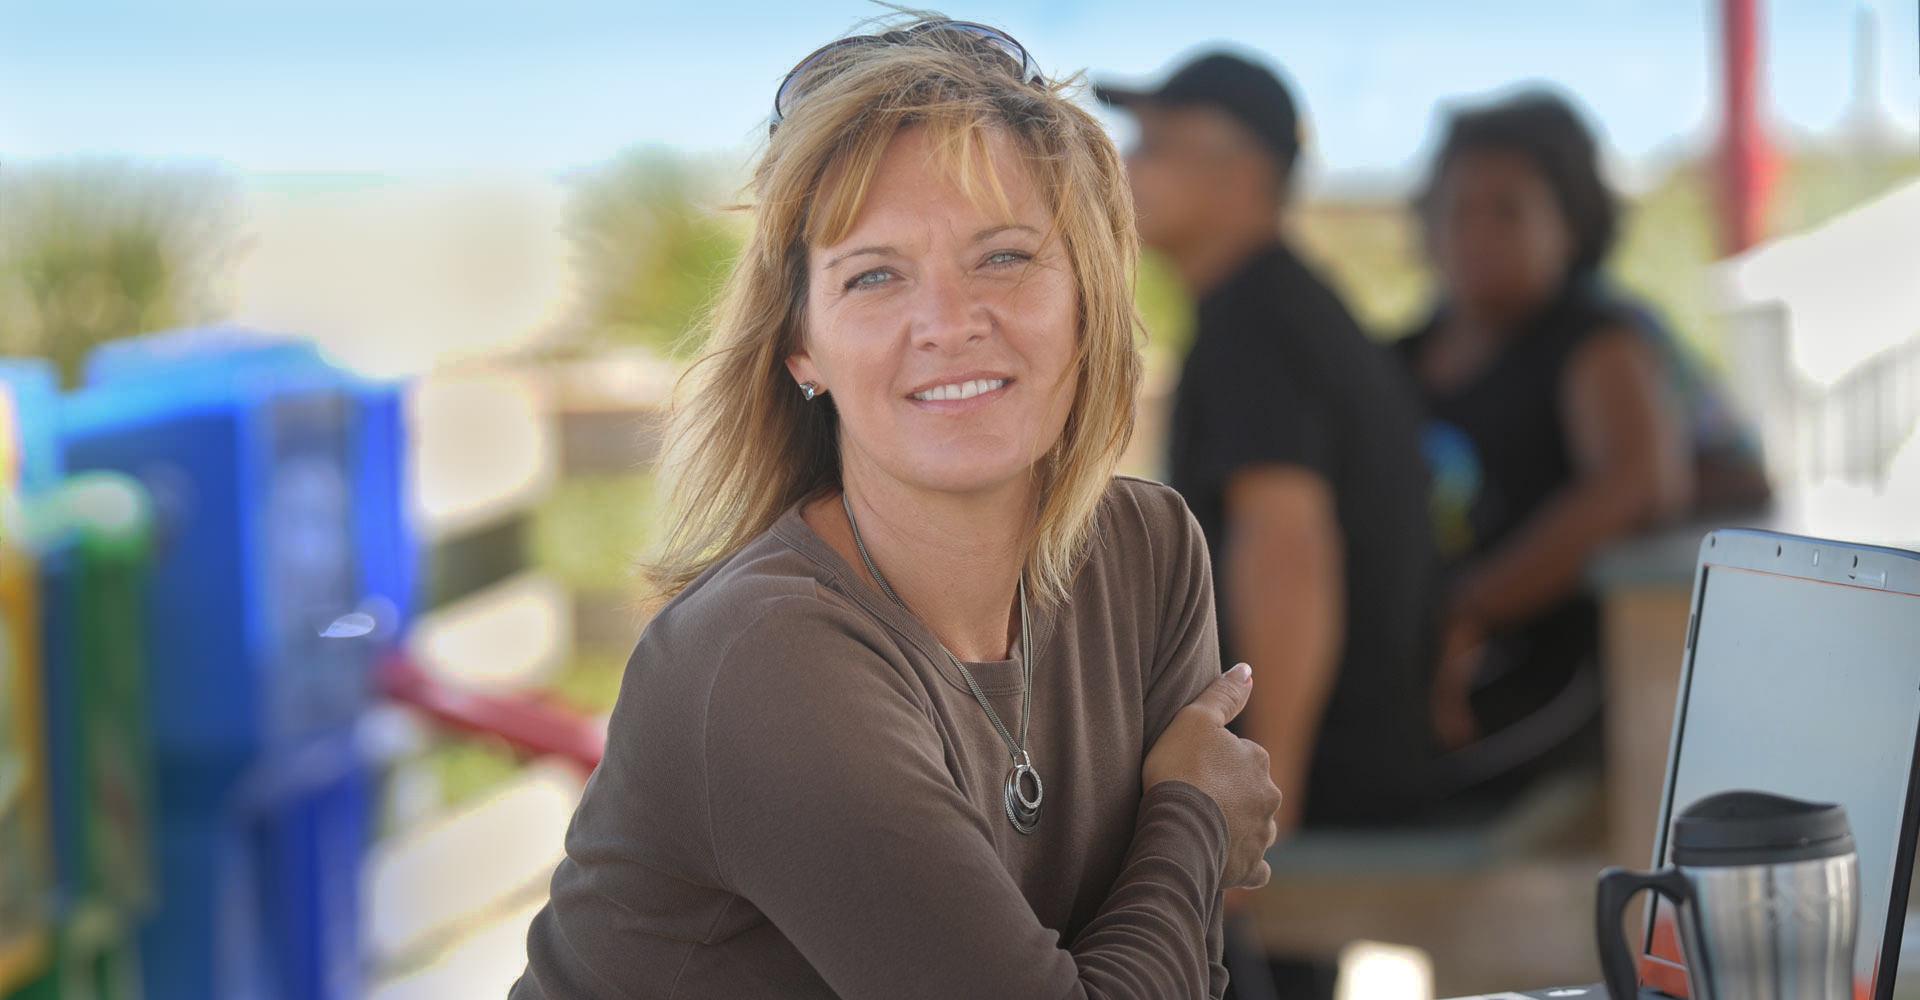 Heather Beaven